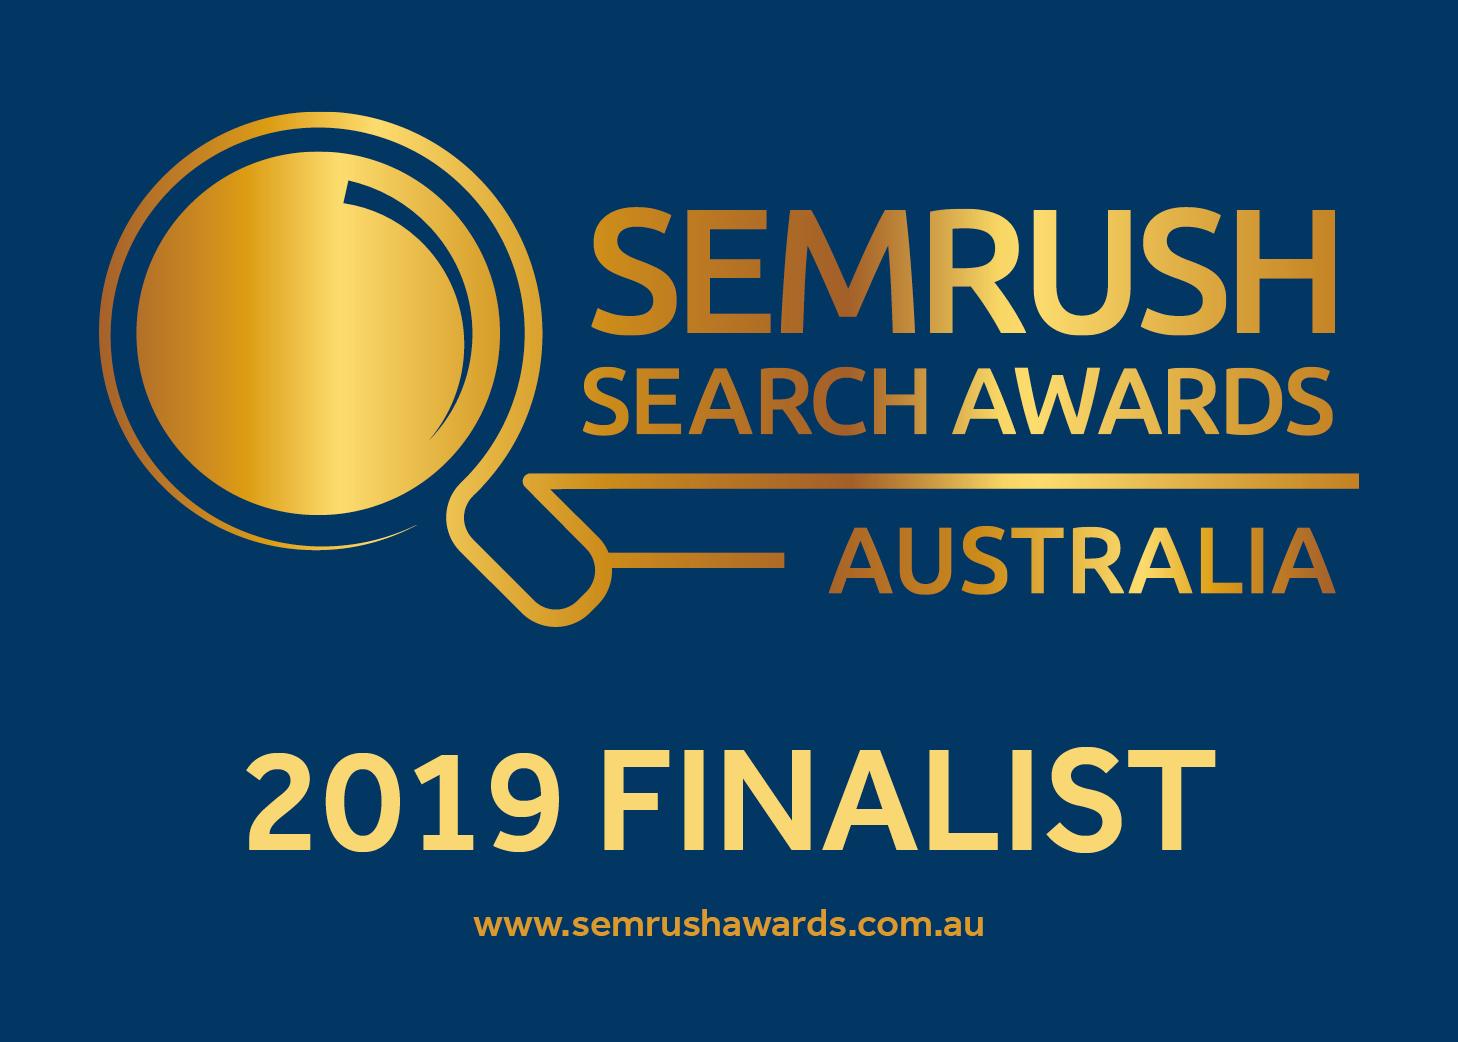 Semrush Search Awards